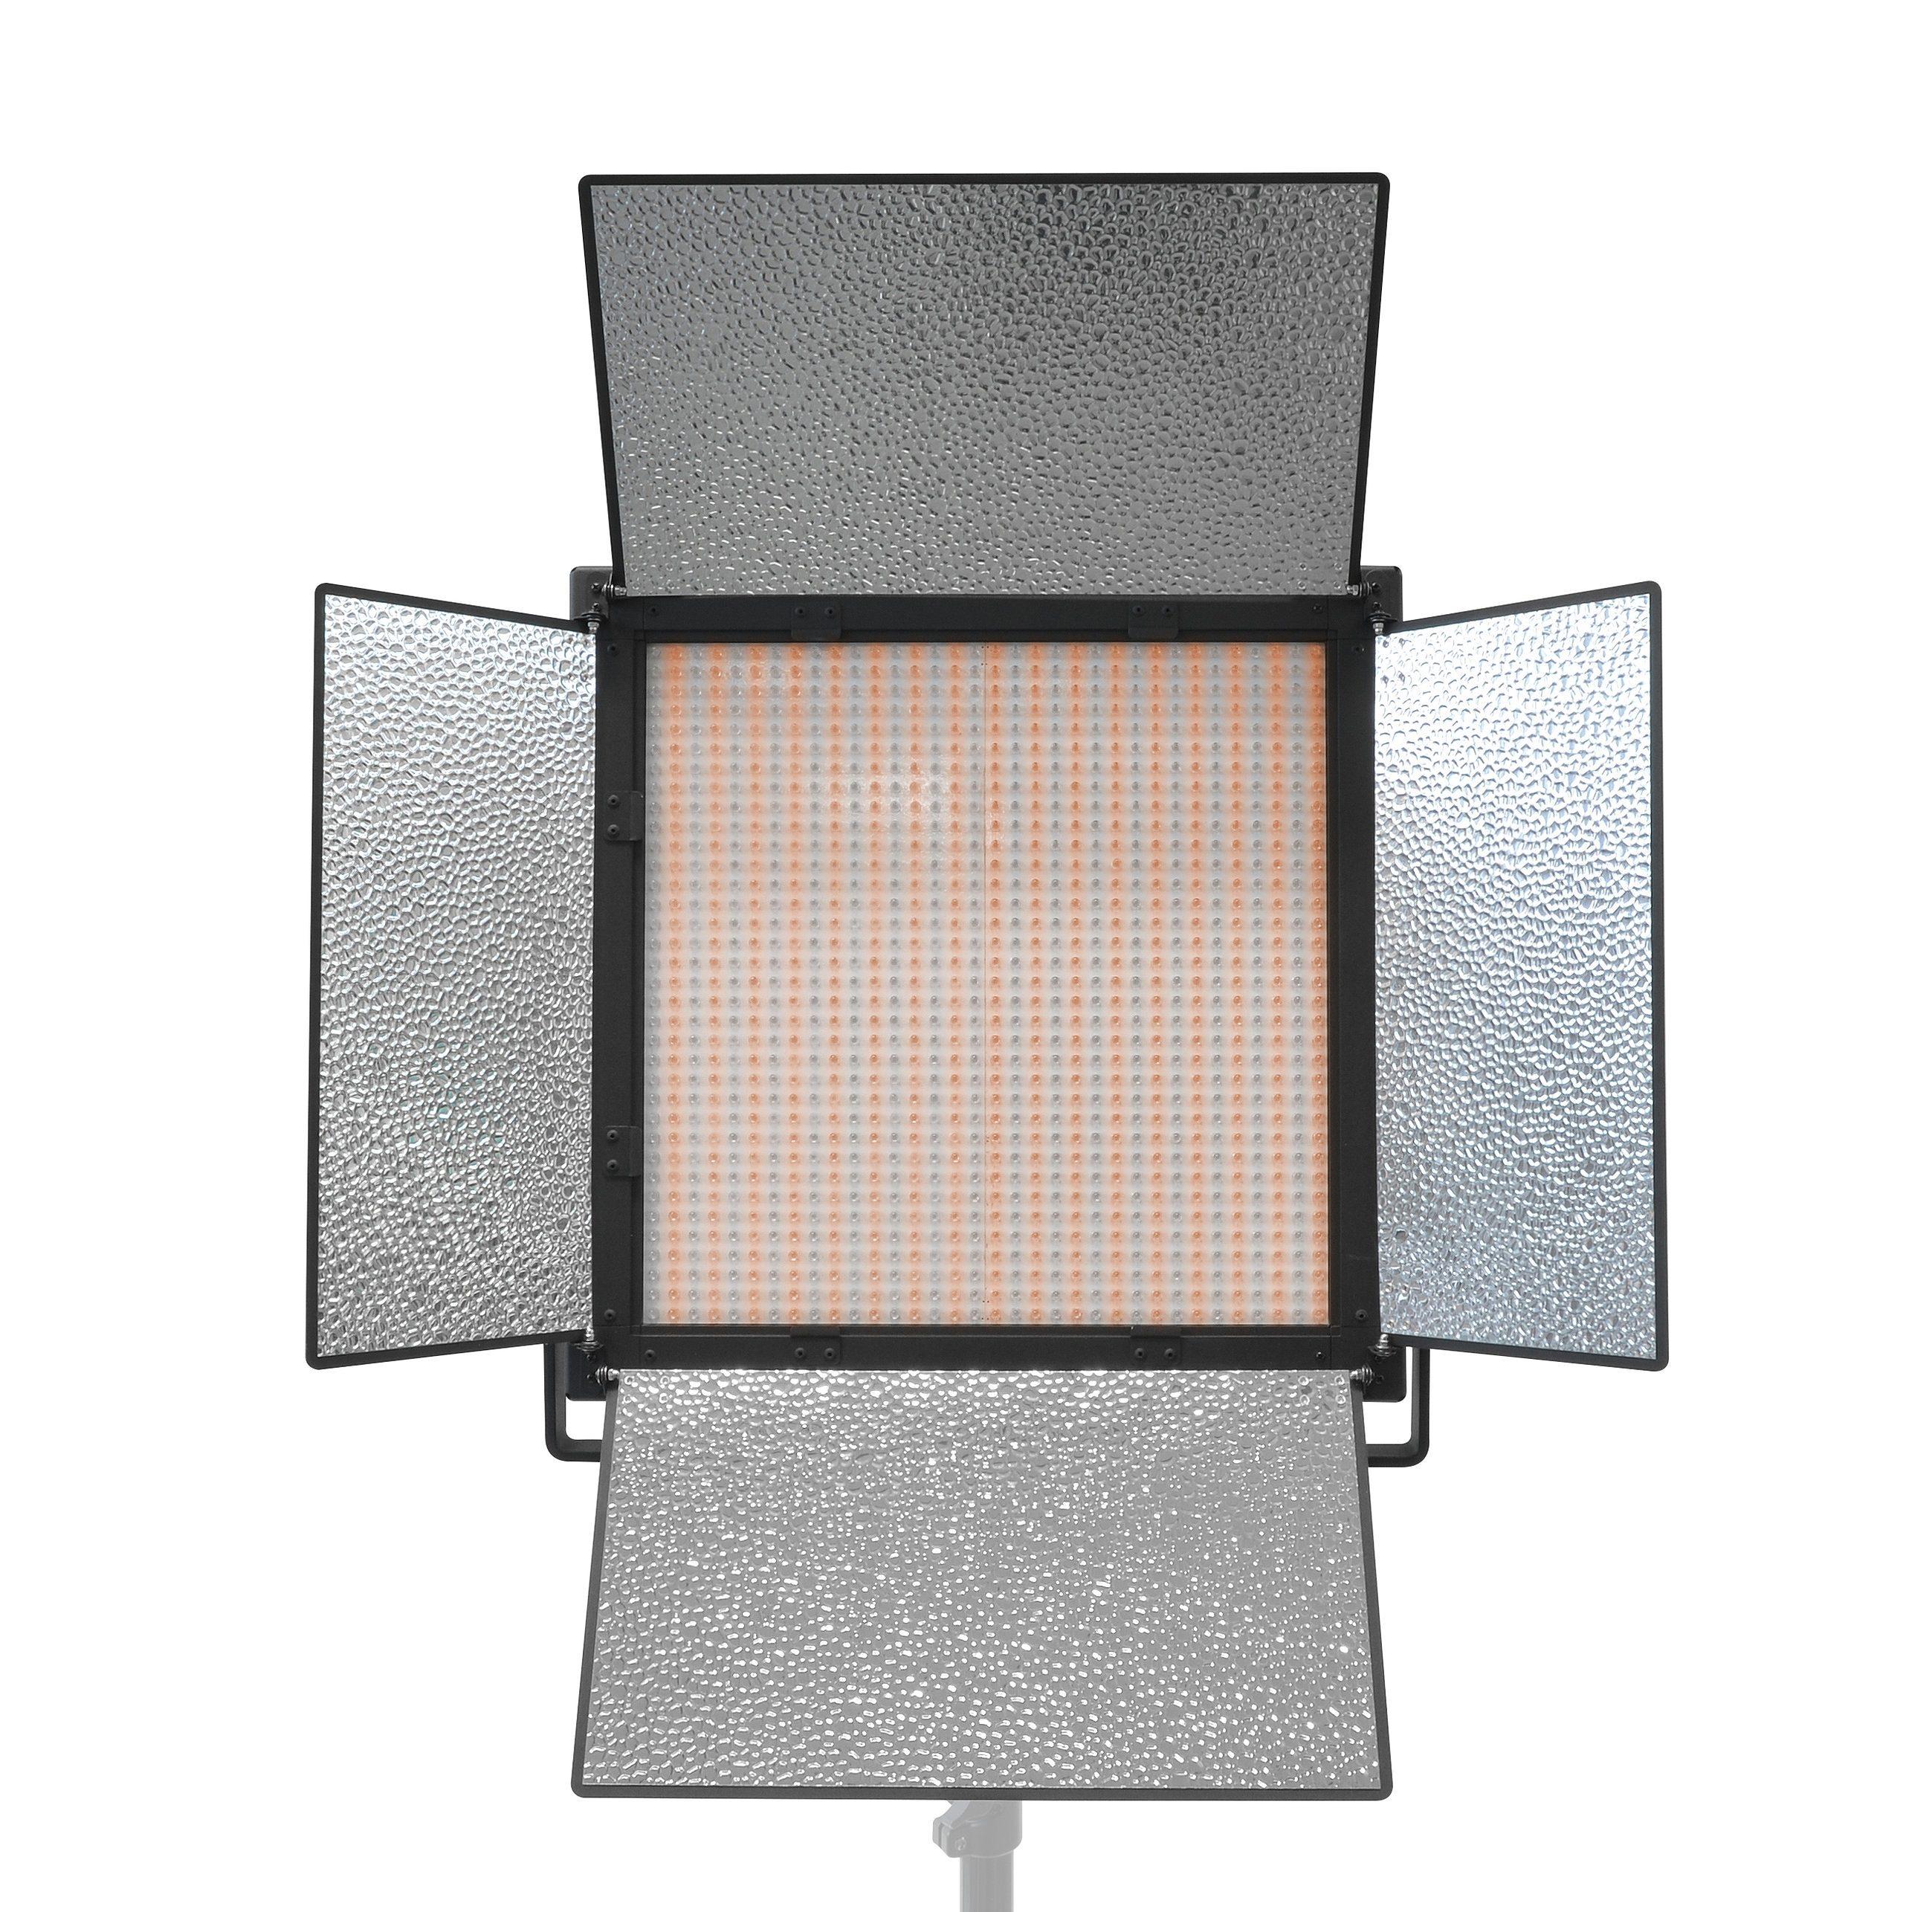 BRESSER Fotostudio »BRESSER LED Flächenleuchte BiColor 37,5W/5.600LUX«